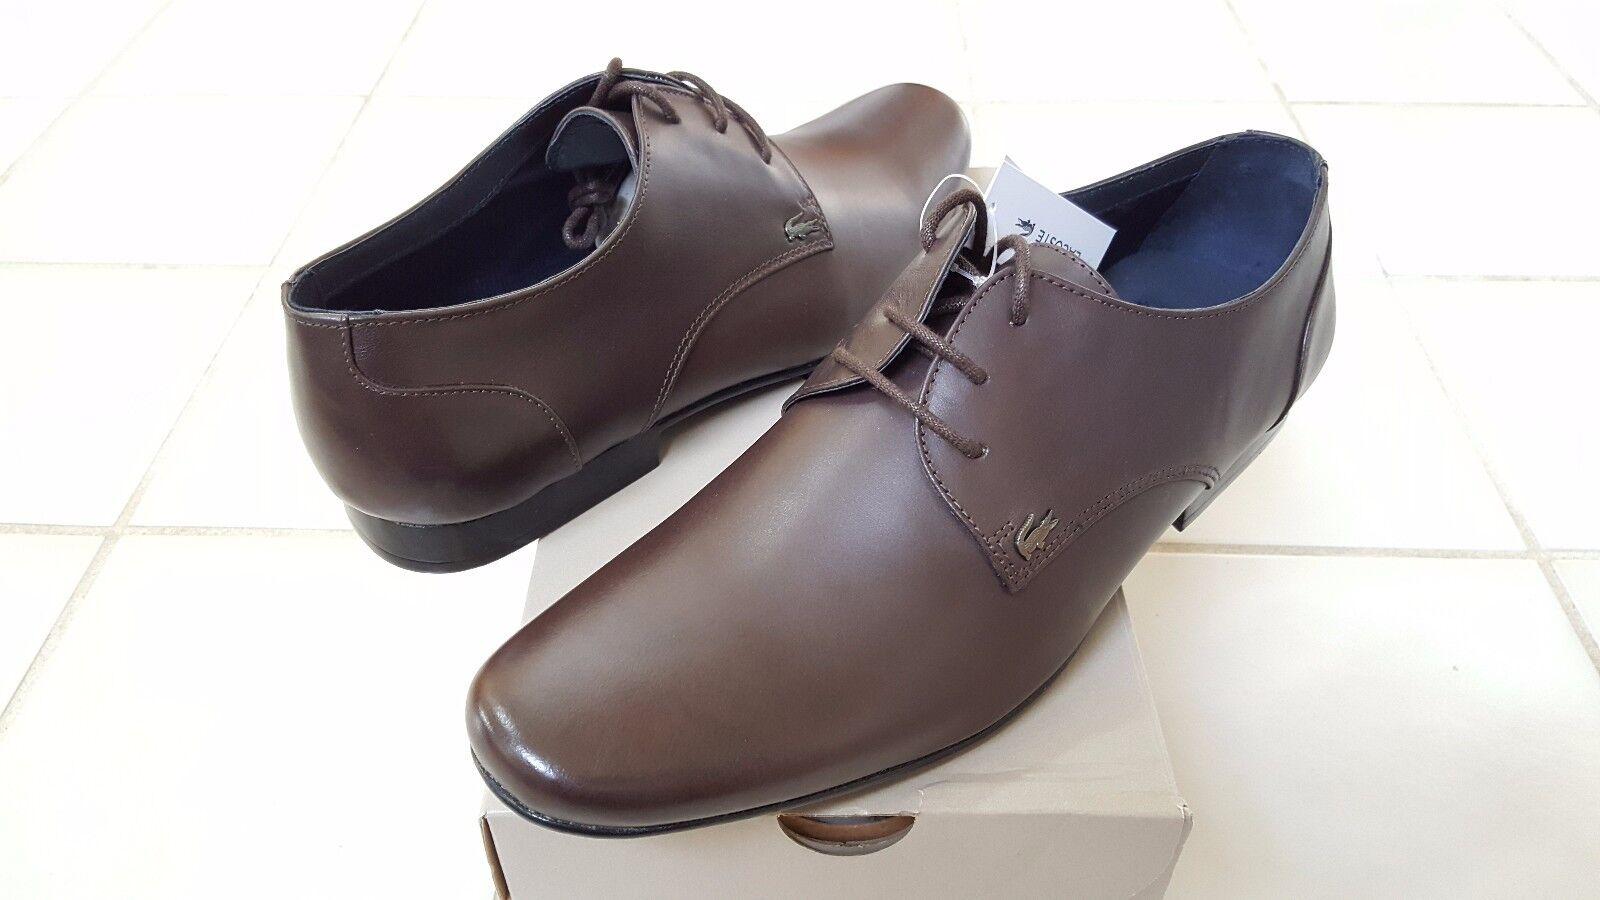 8f916ddc2659e9 Lacoste 722clm1071118 Henri CLM LTH Mn s (m) Brown Leather Oxfords ...